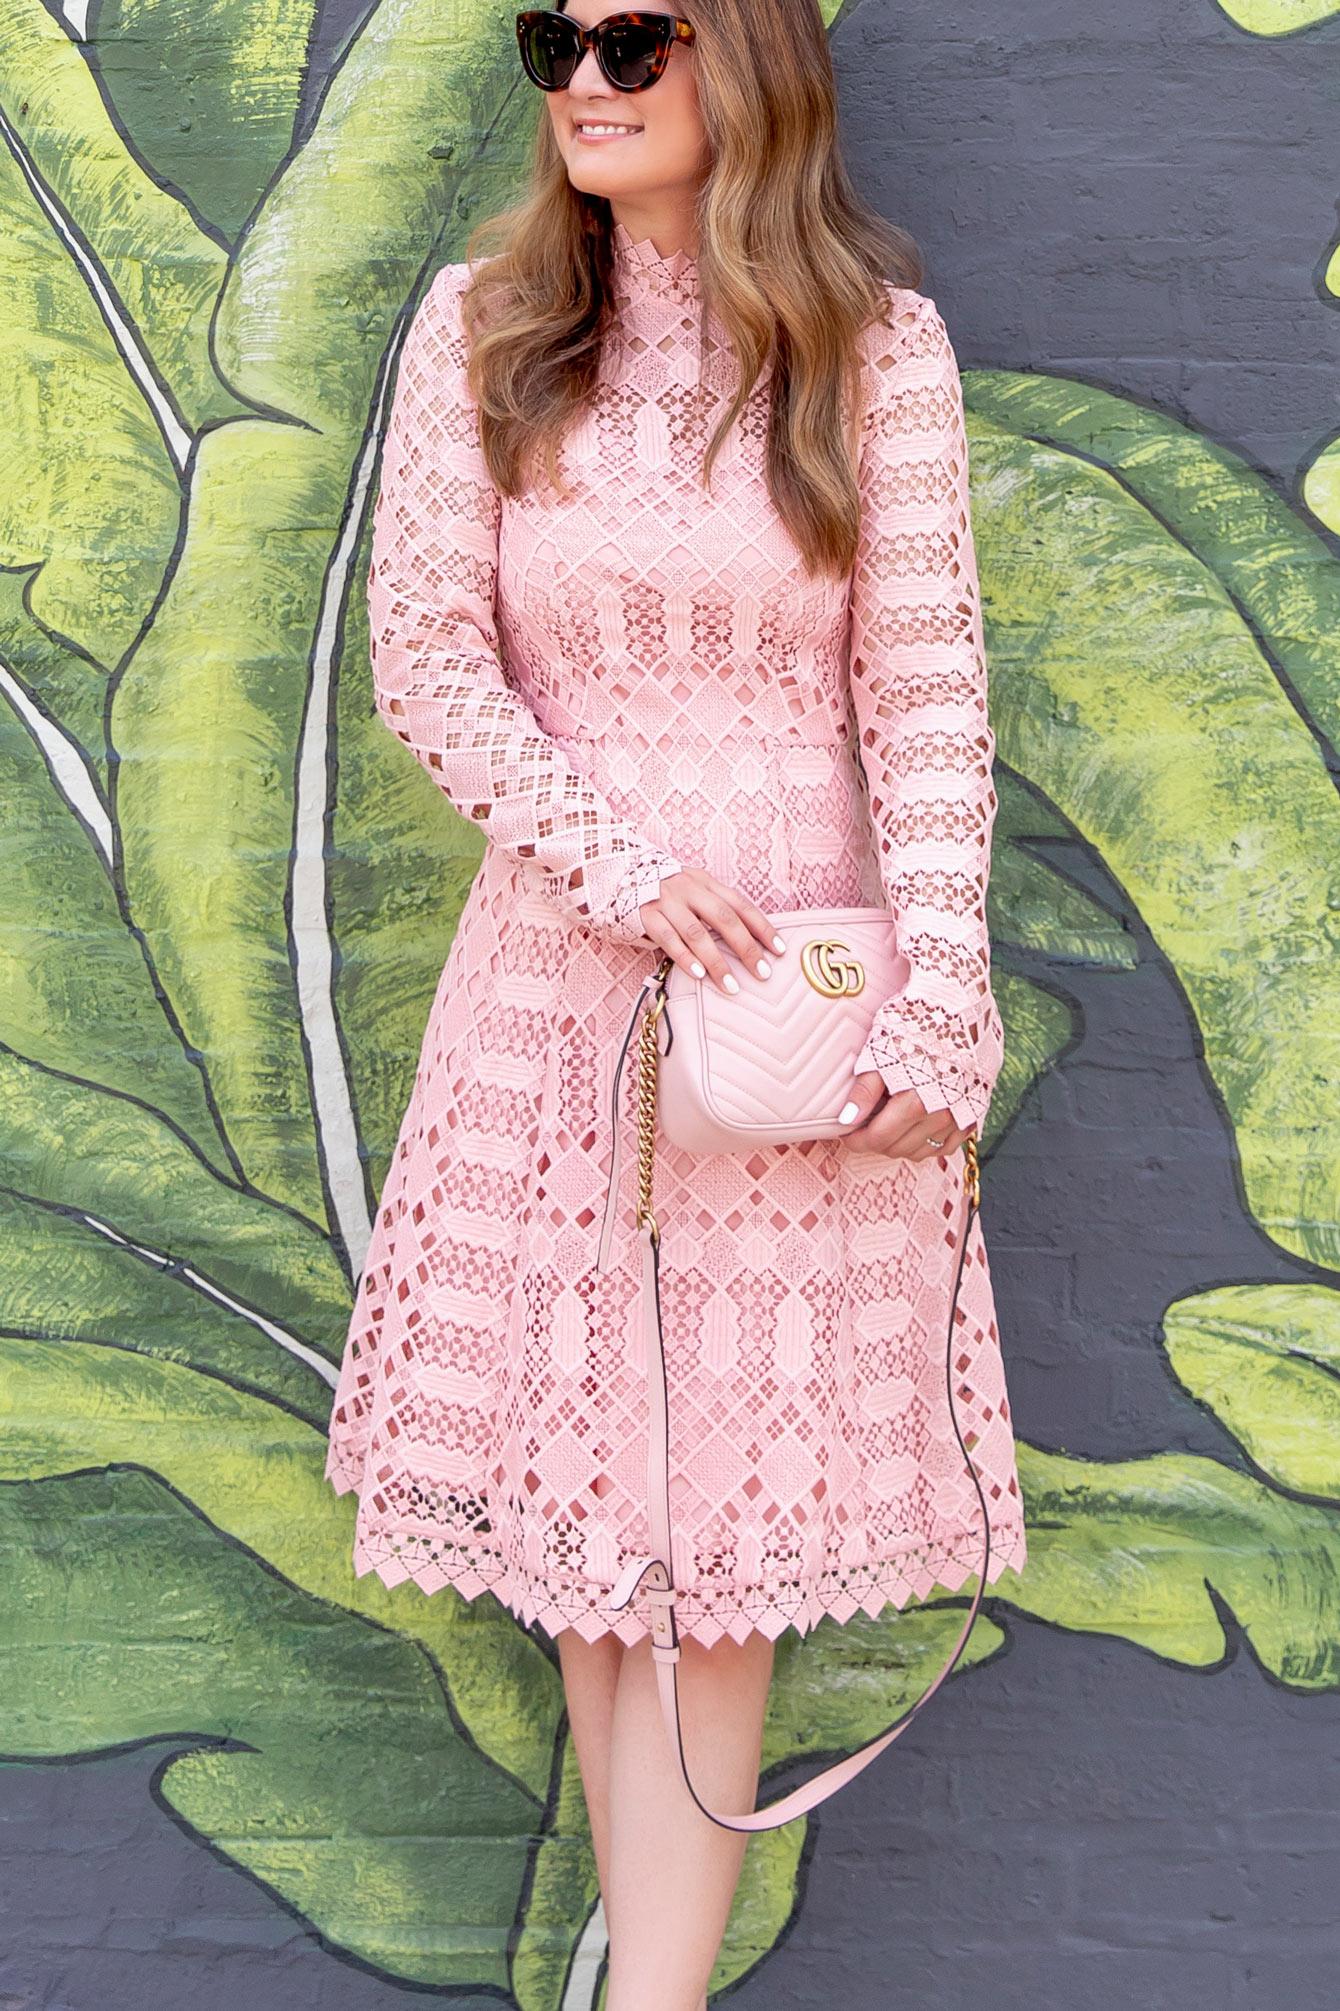 Pink Gucci Marmont Camera Bag